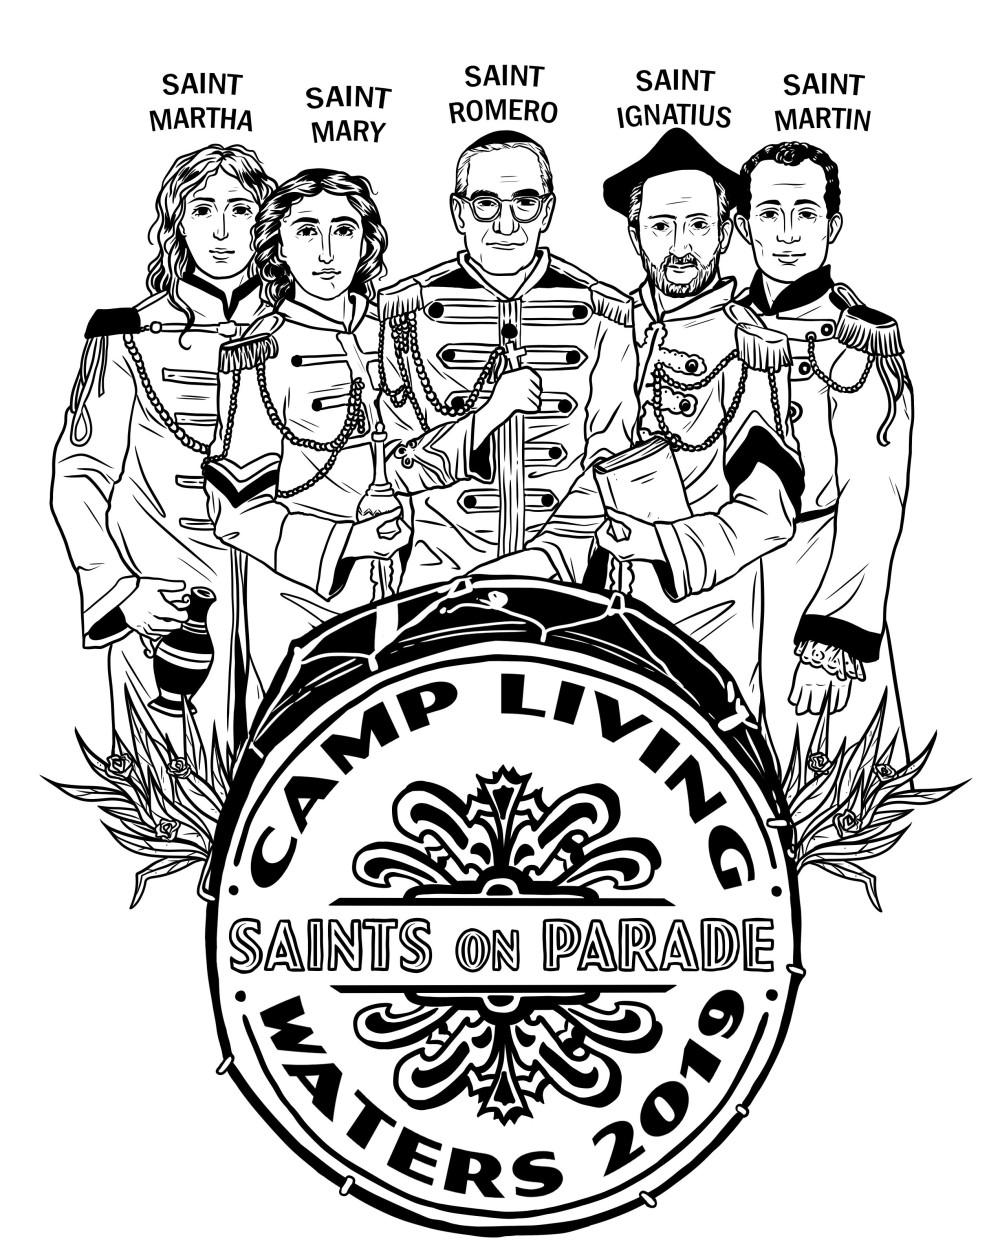 Saints On Parade Tee Shirt Design.jpg